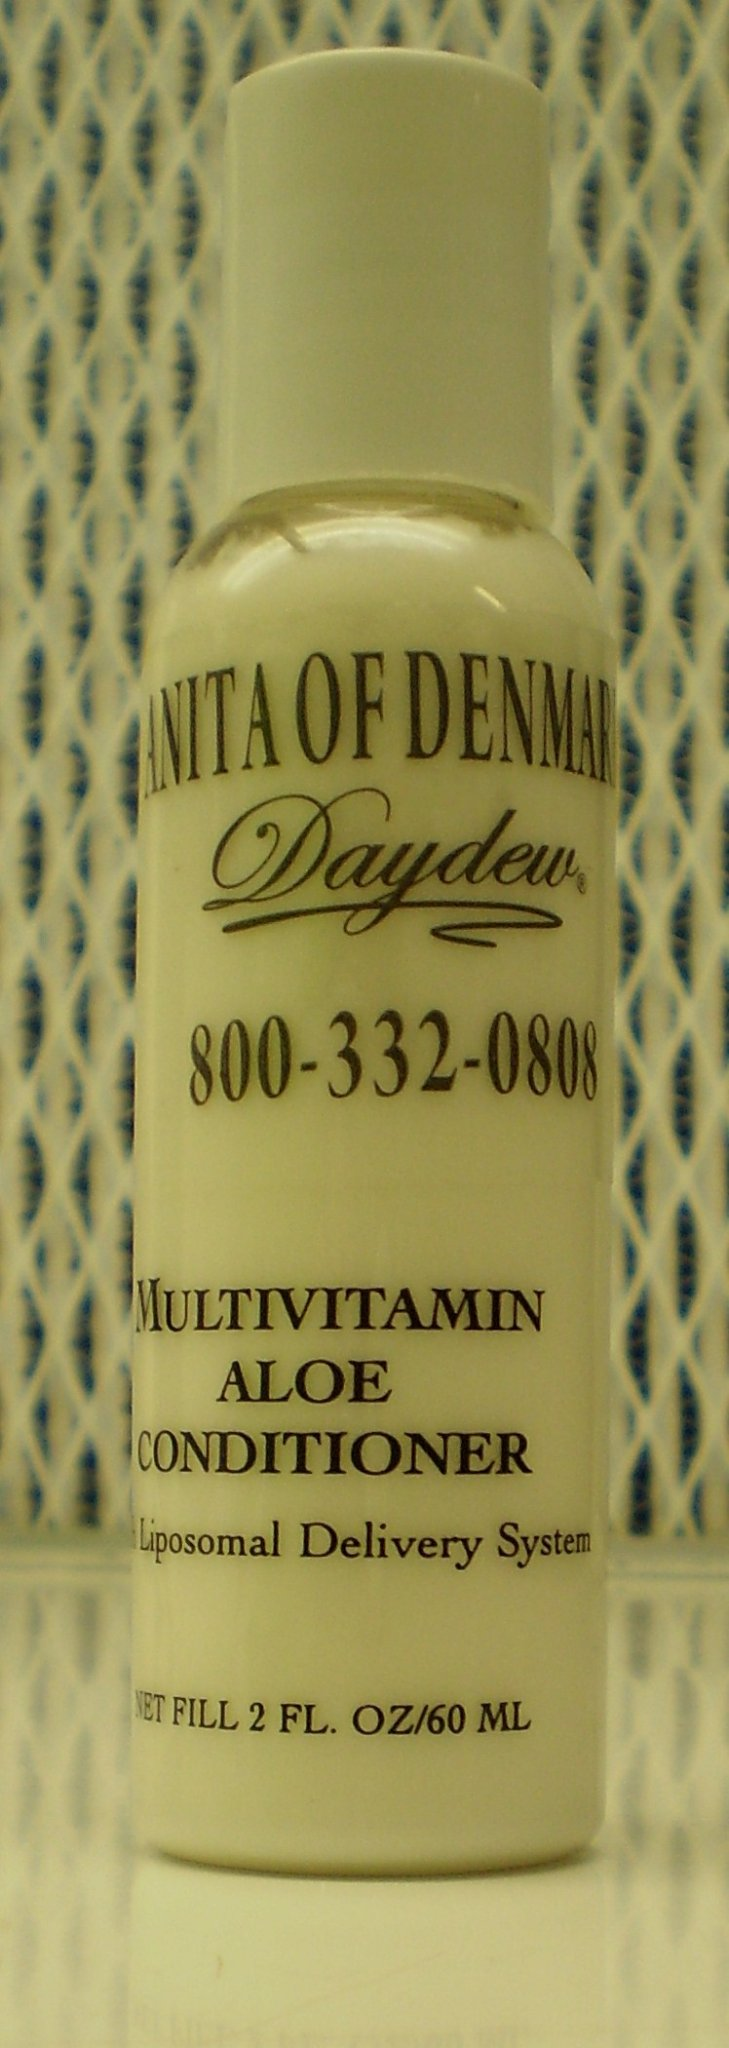 Anita Of Denmark Multivitamin Aloe Conditioner With Liposomal Delivery System